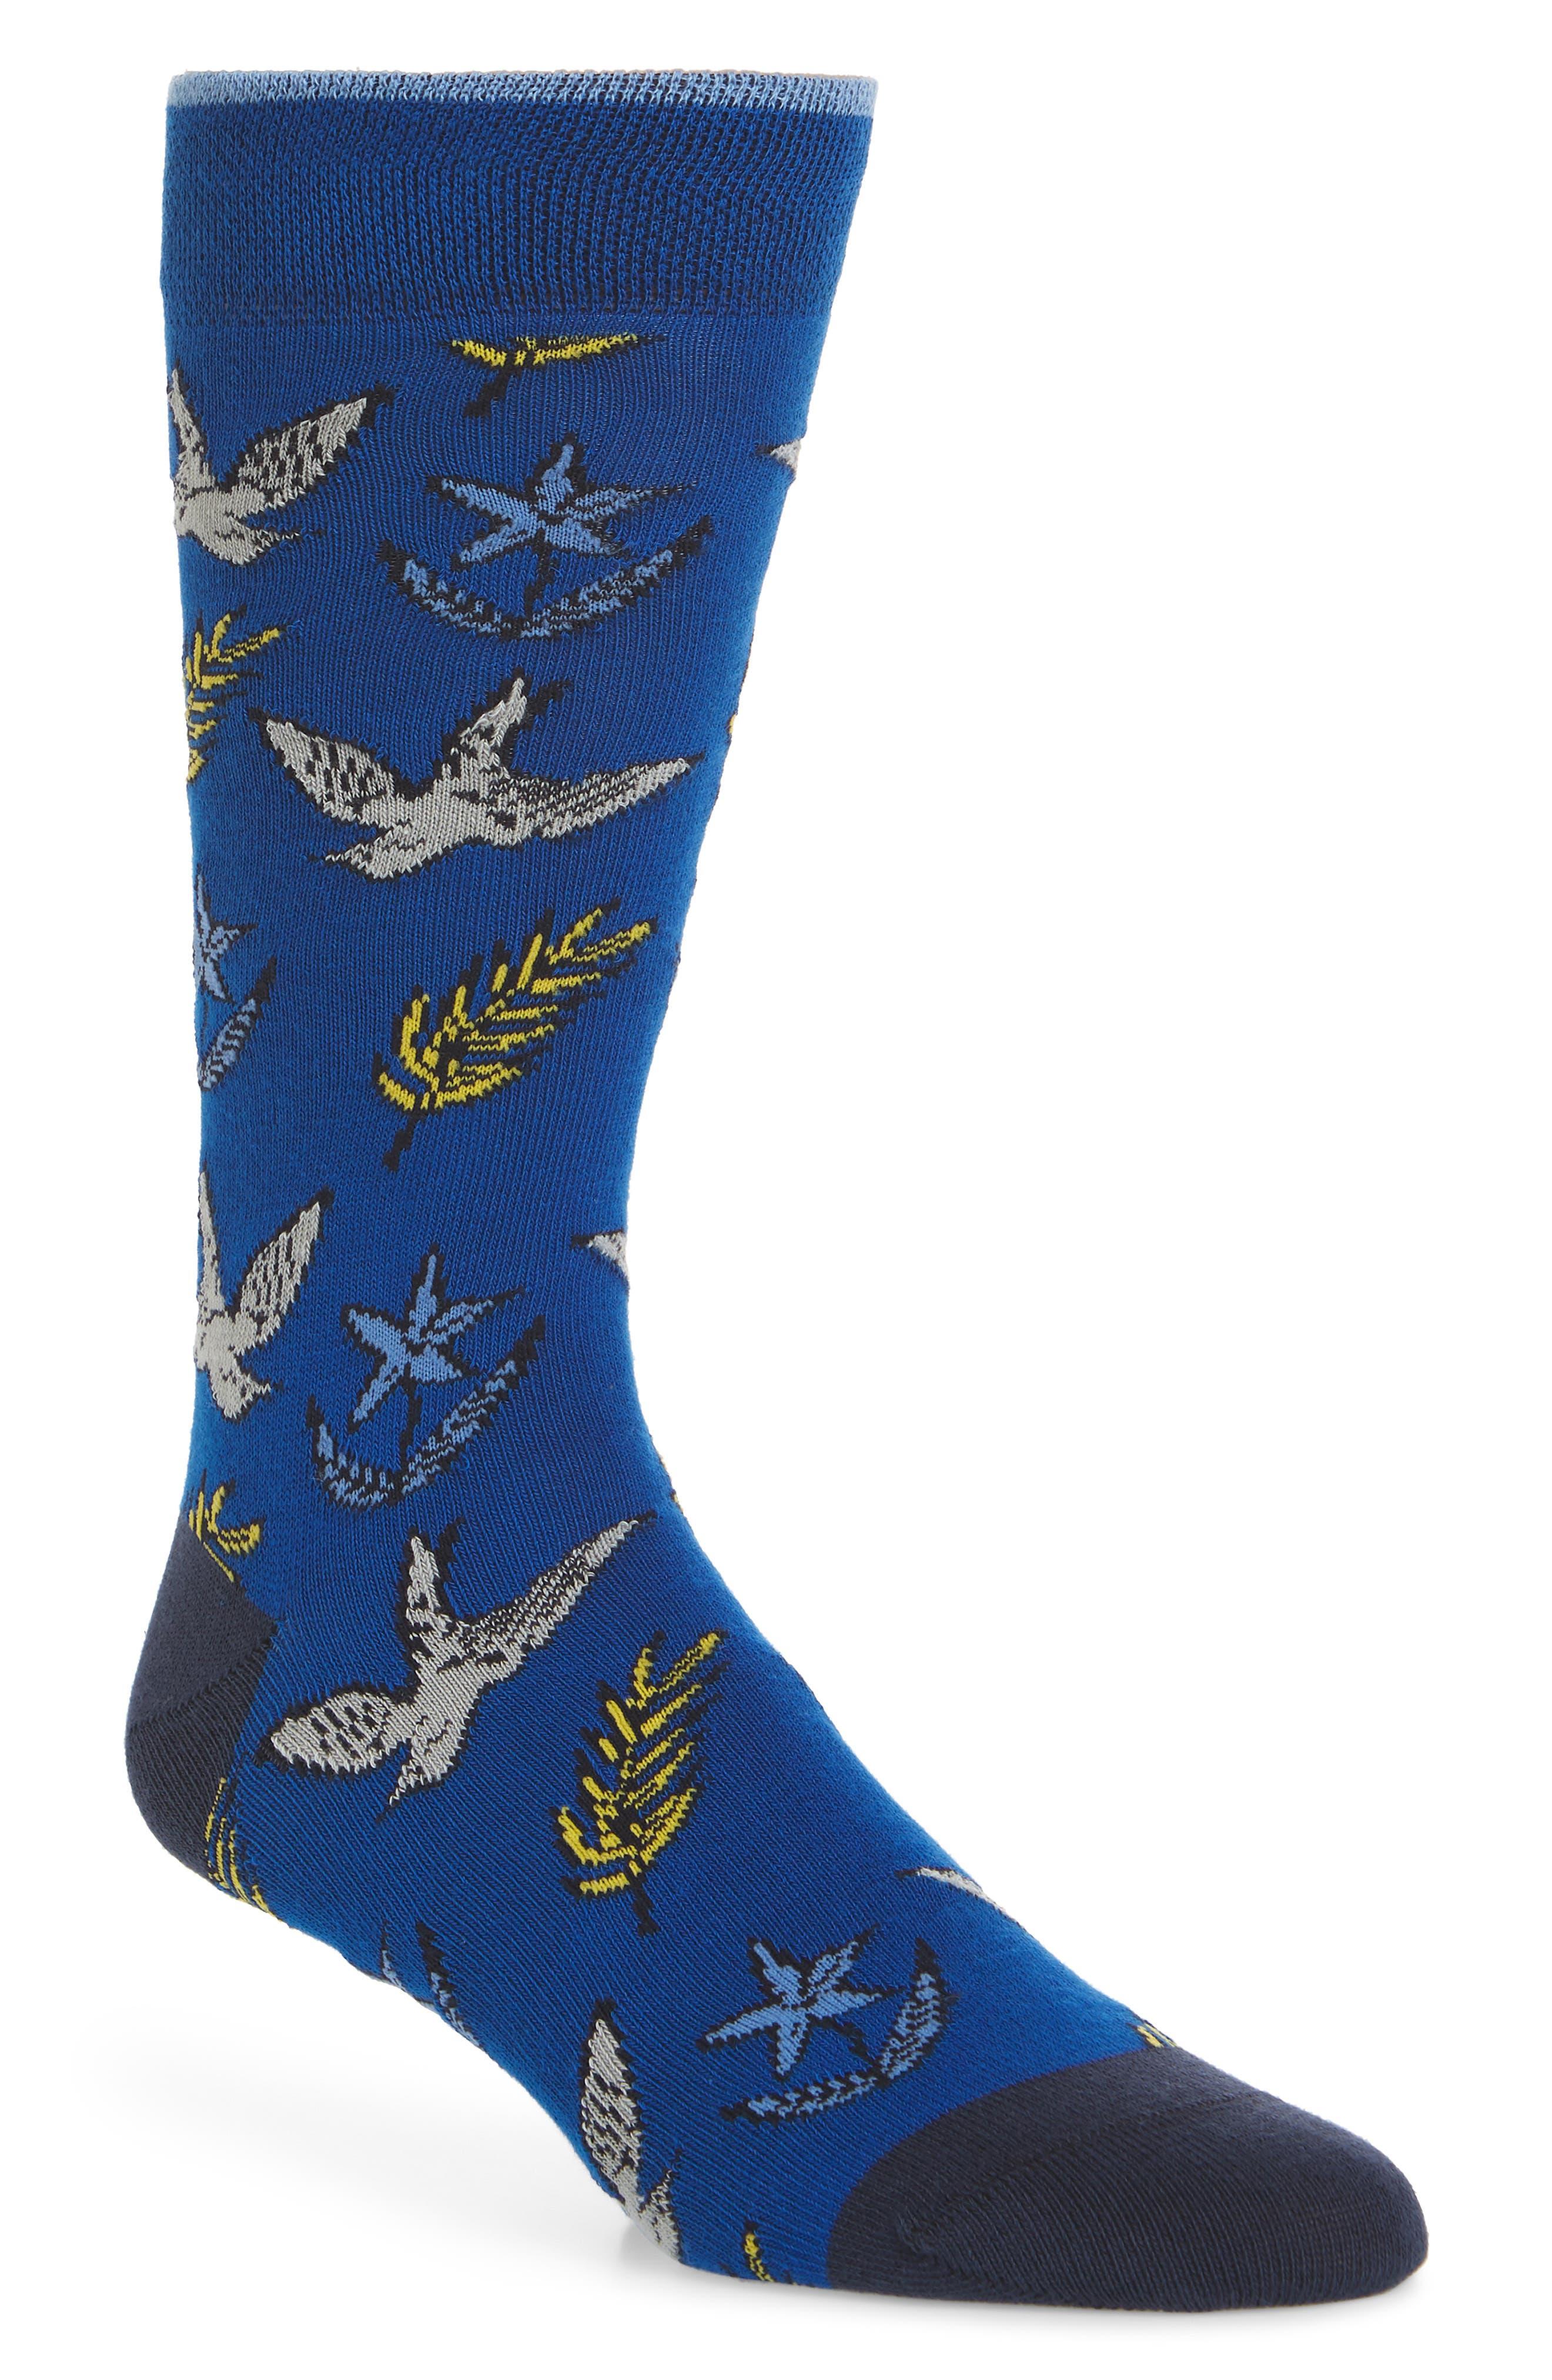 Leee Print Socks,                         Main,                         color, BRIGHT BLUE